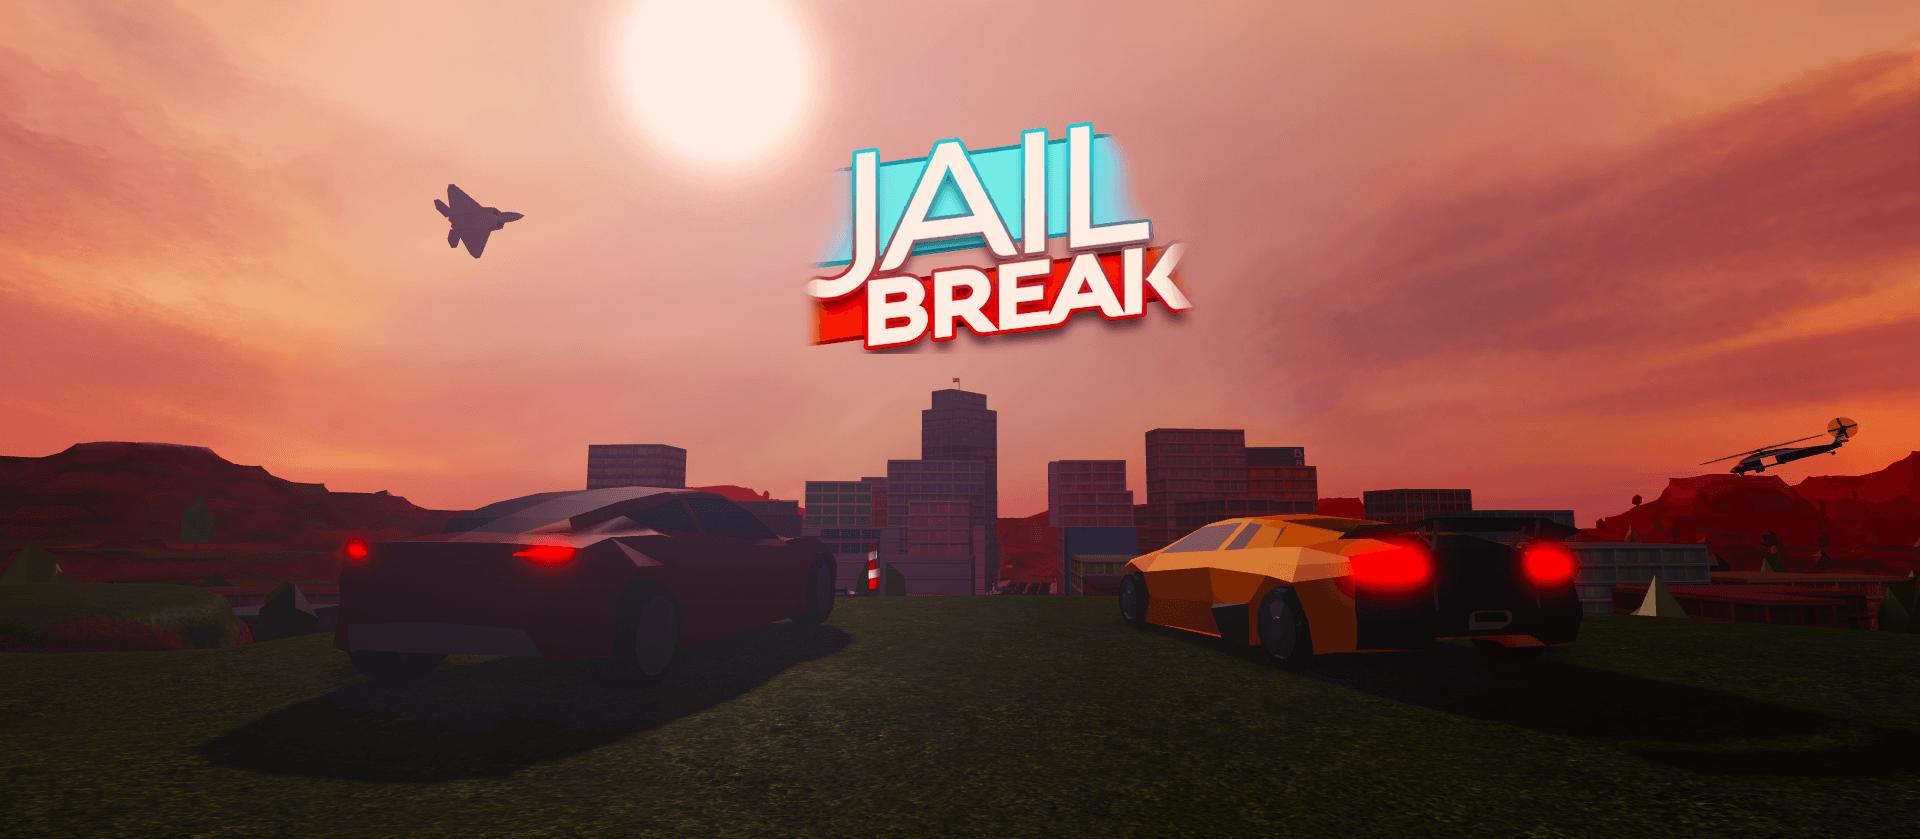 Roblox Jailbreak Wallpapers Top Free Roblox Jailbreak Backgrounds Wallpaperaccess